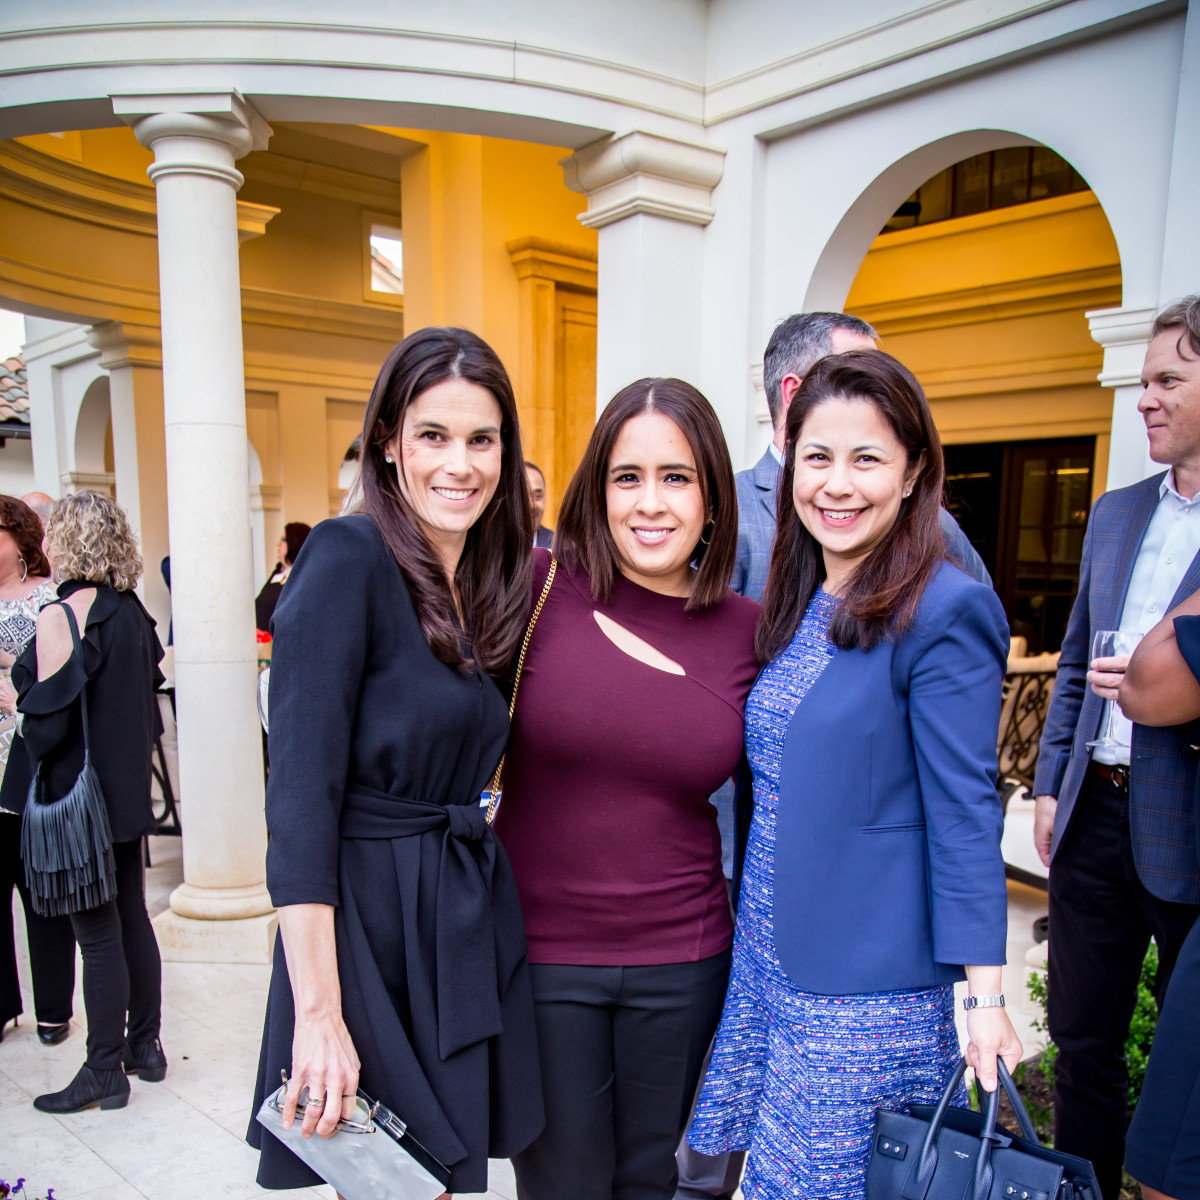 Melanie Jabbour, Julie Clark, Charmaine Tang